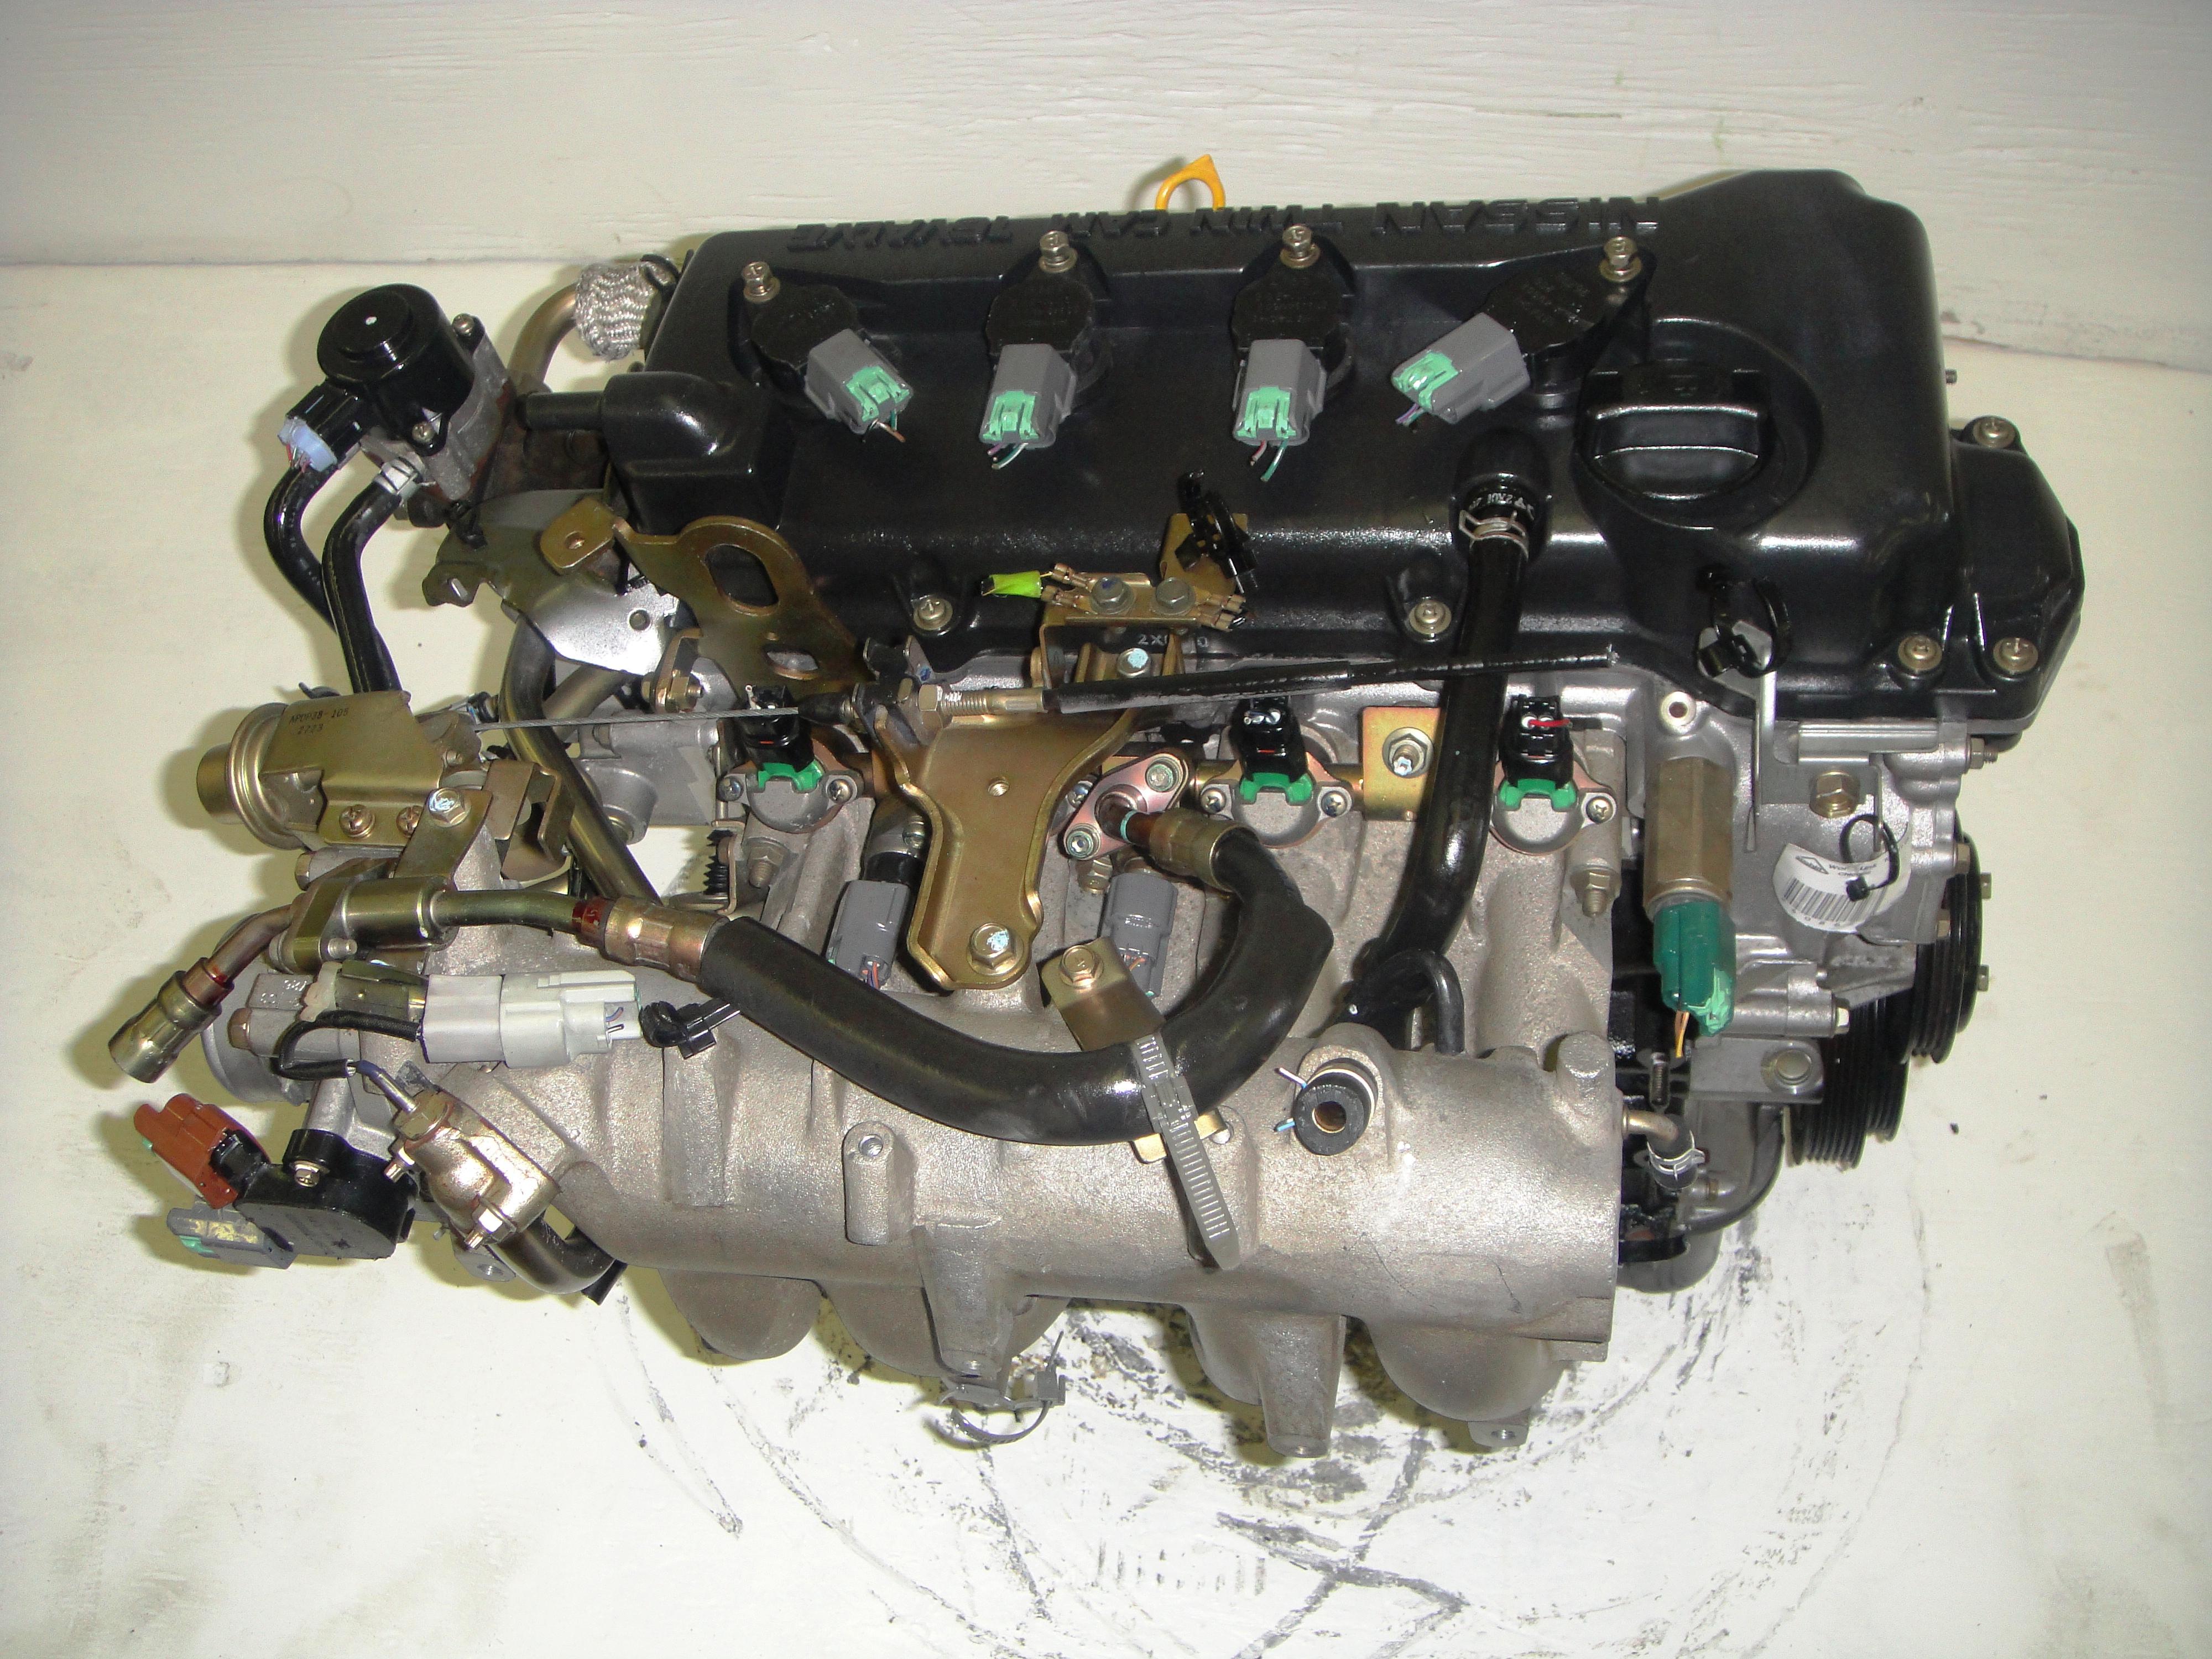 2002 Nissan Sentra Engine